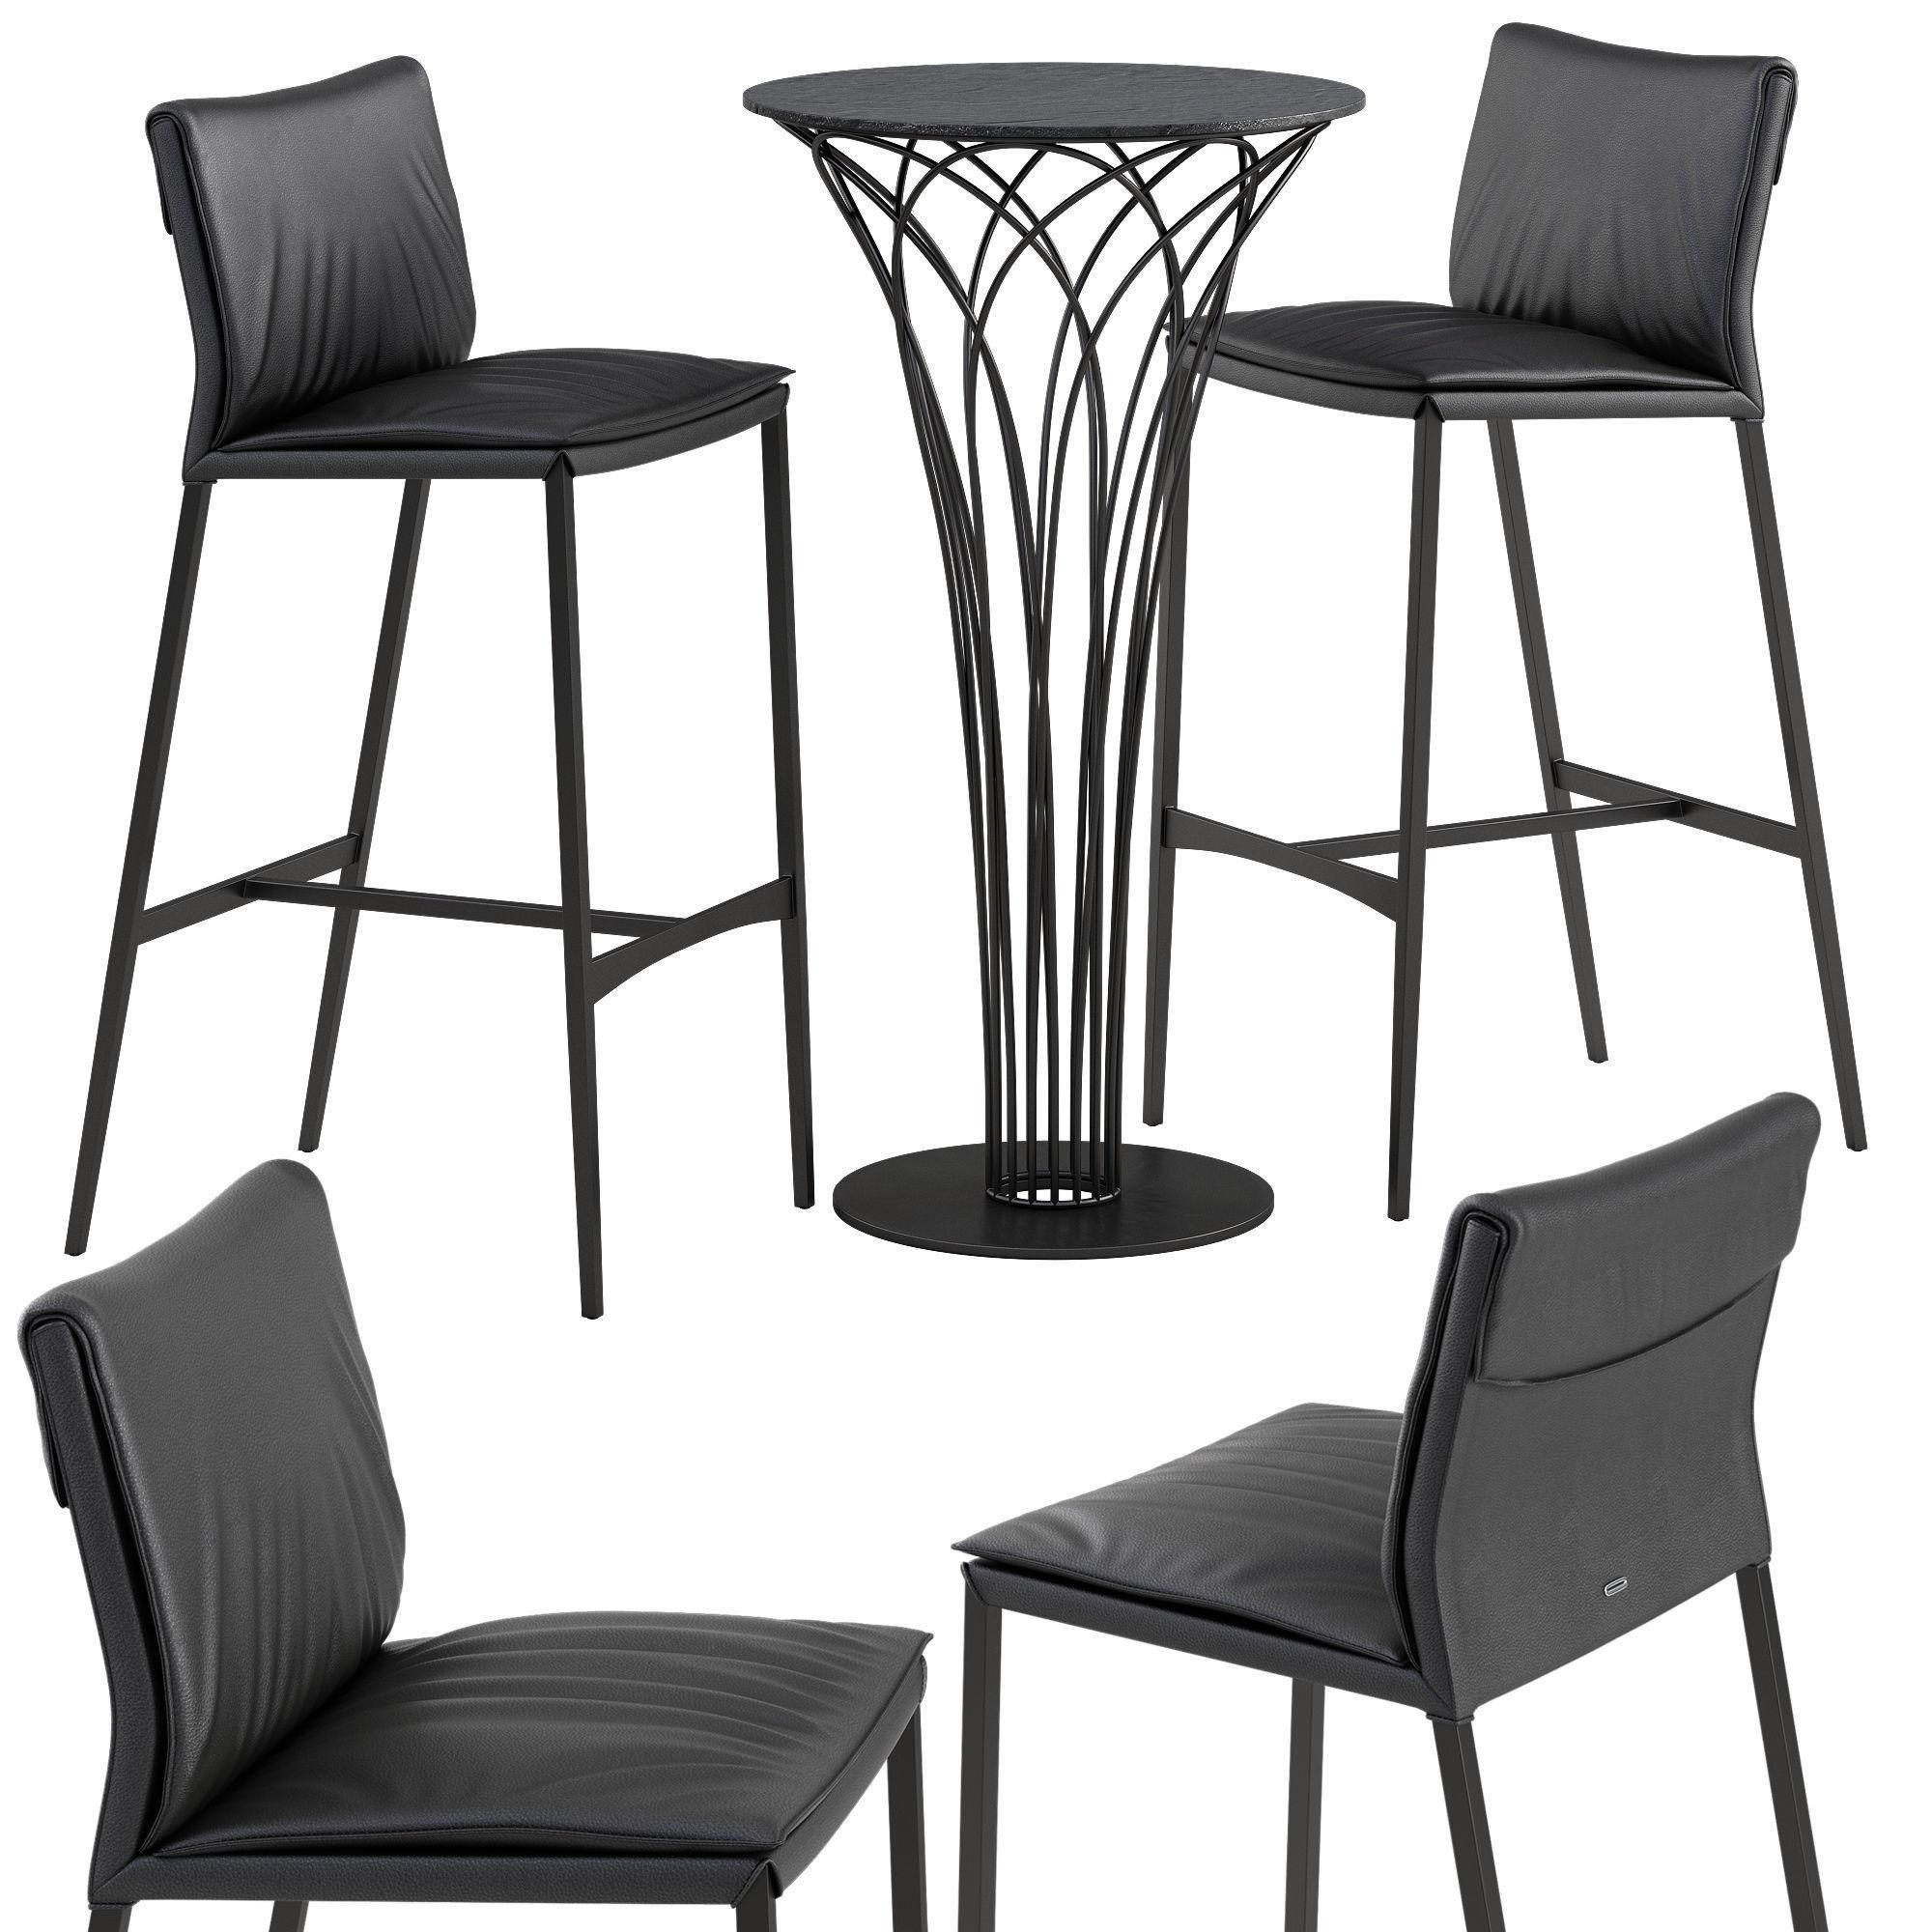 Miraculous Cattelan Italia Isabel Barstool Nido Table Set 3D Model Andrewgaddart Wooden Chair Designs For Living Room Andrewgaddartcom